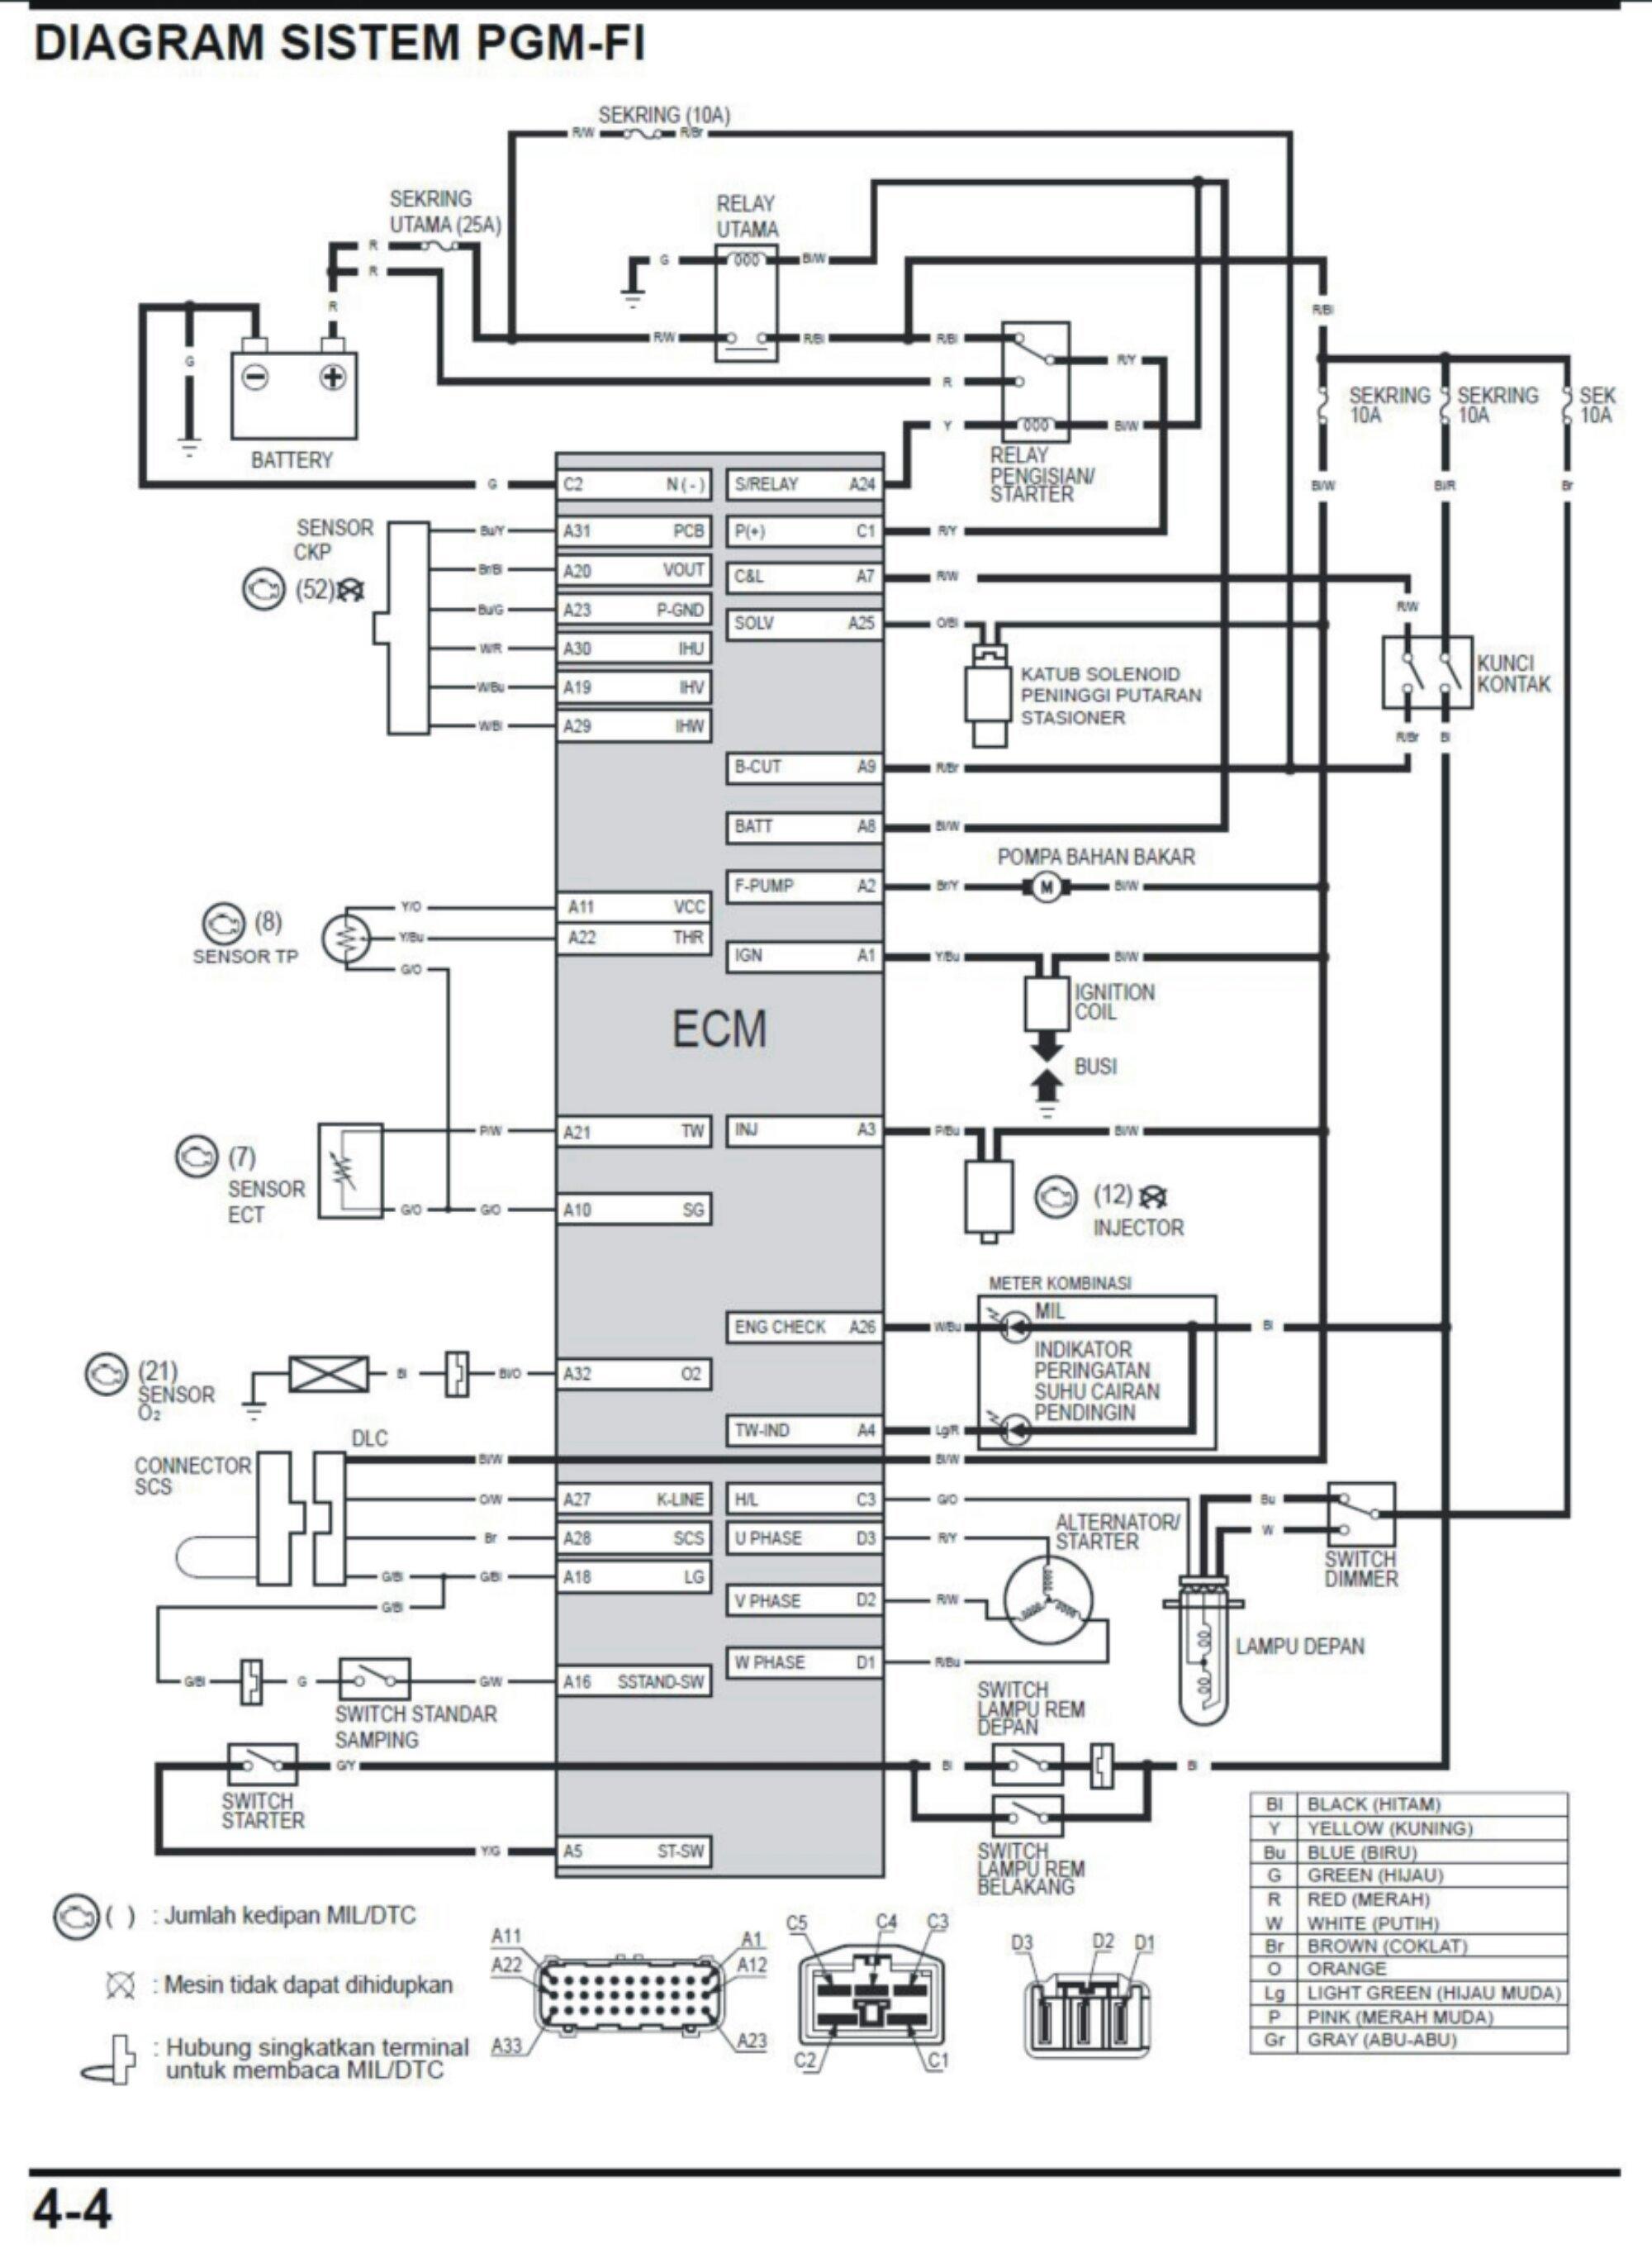 Udin View 23 Wiring Diagram Honda Beat Pgm Fi